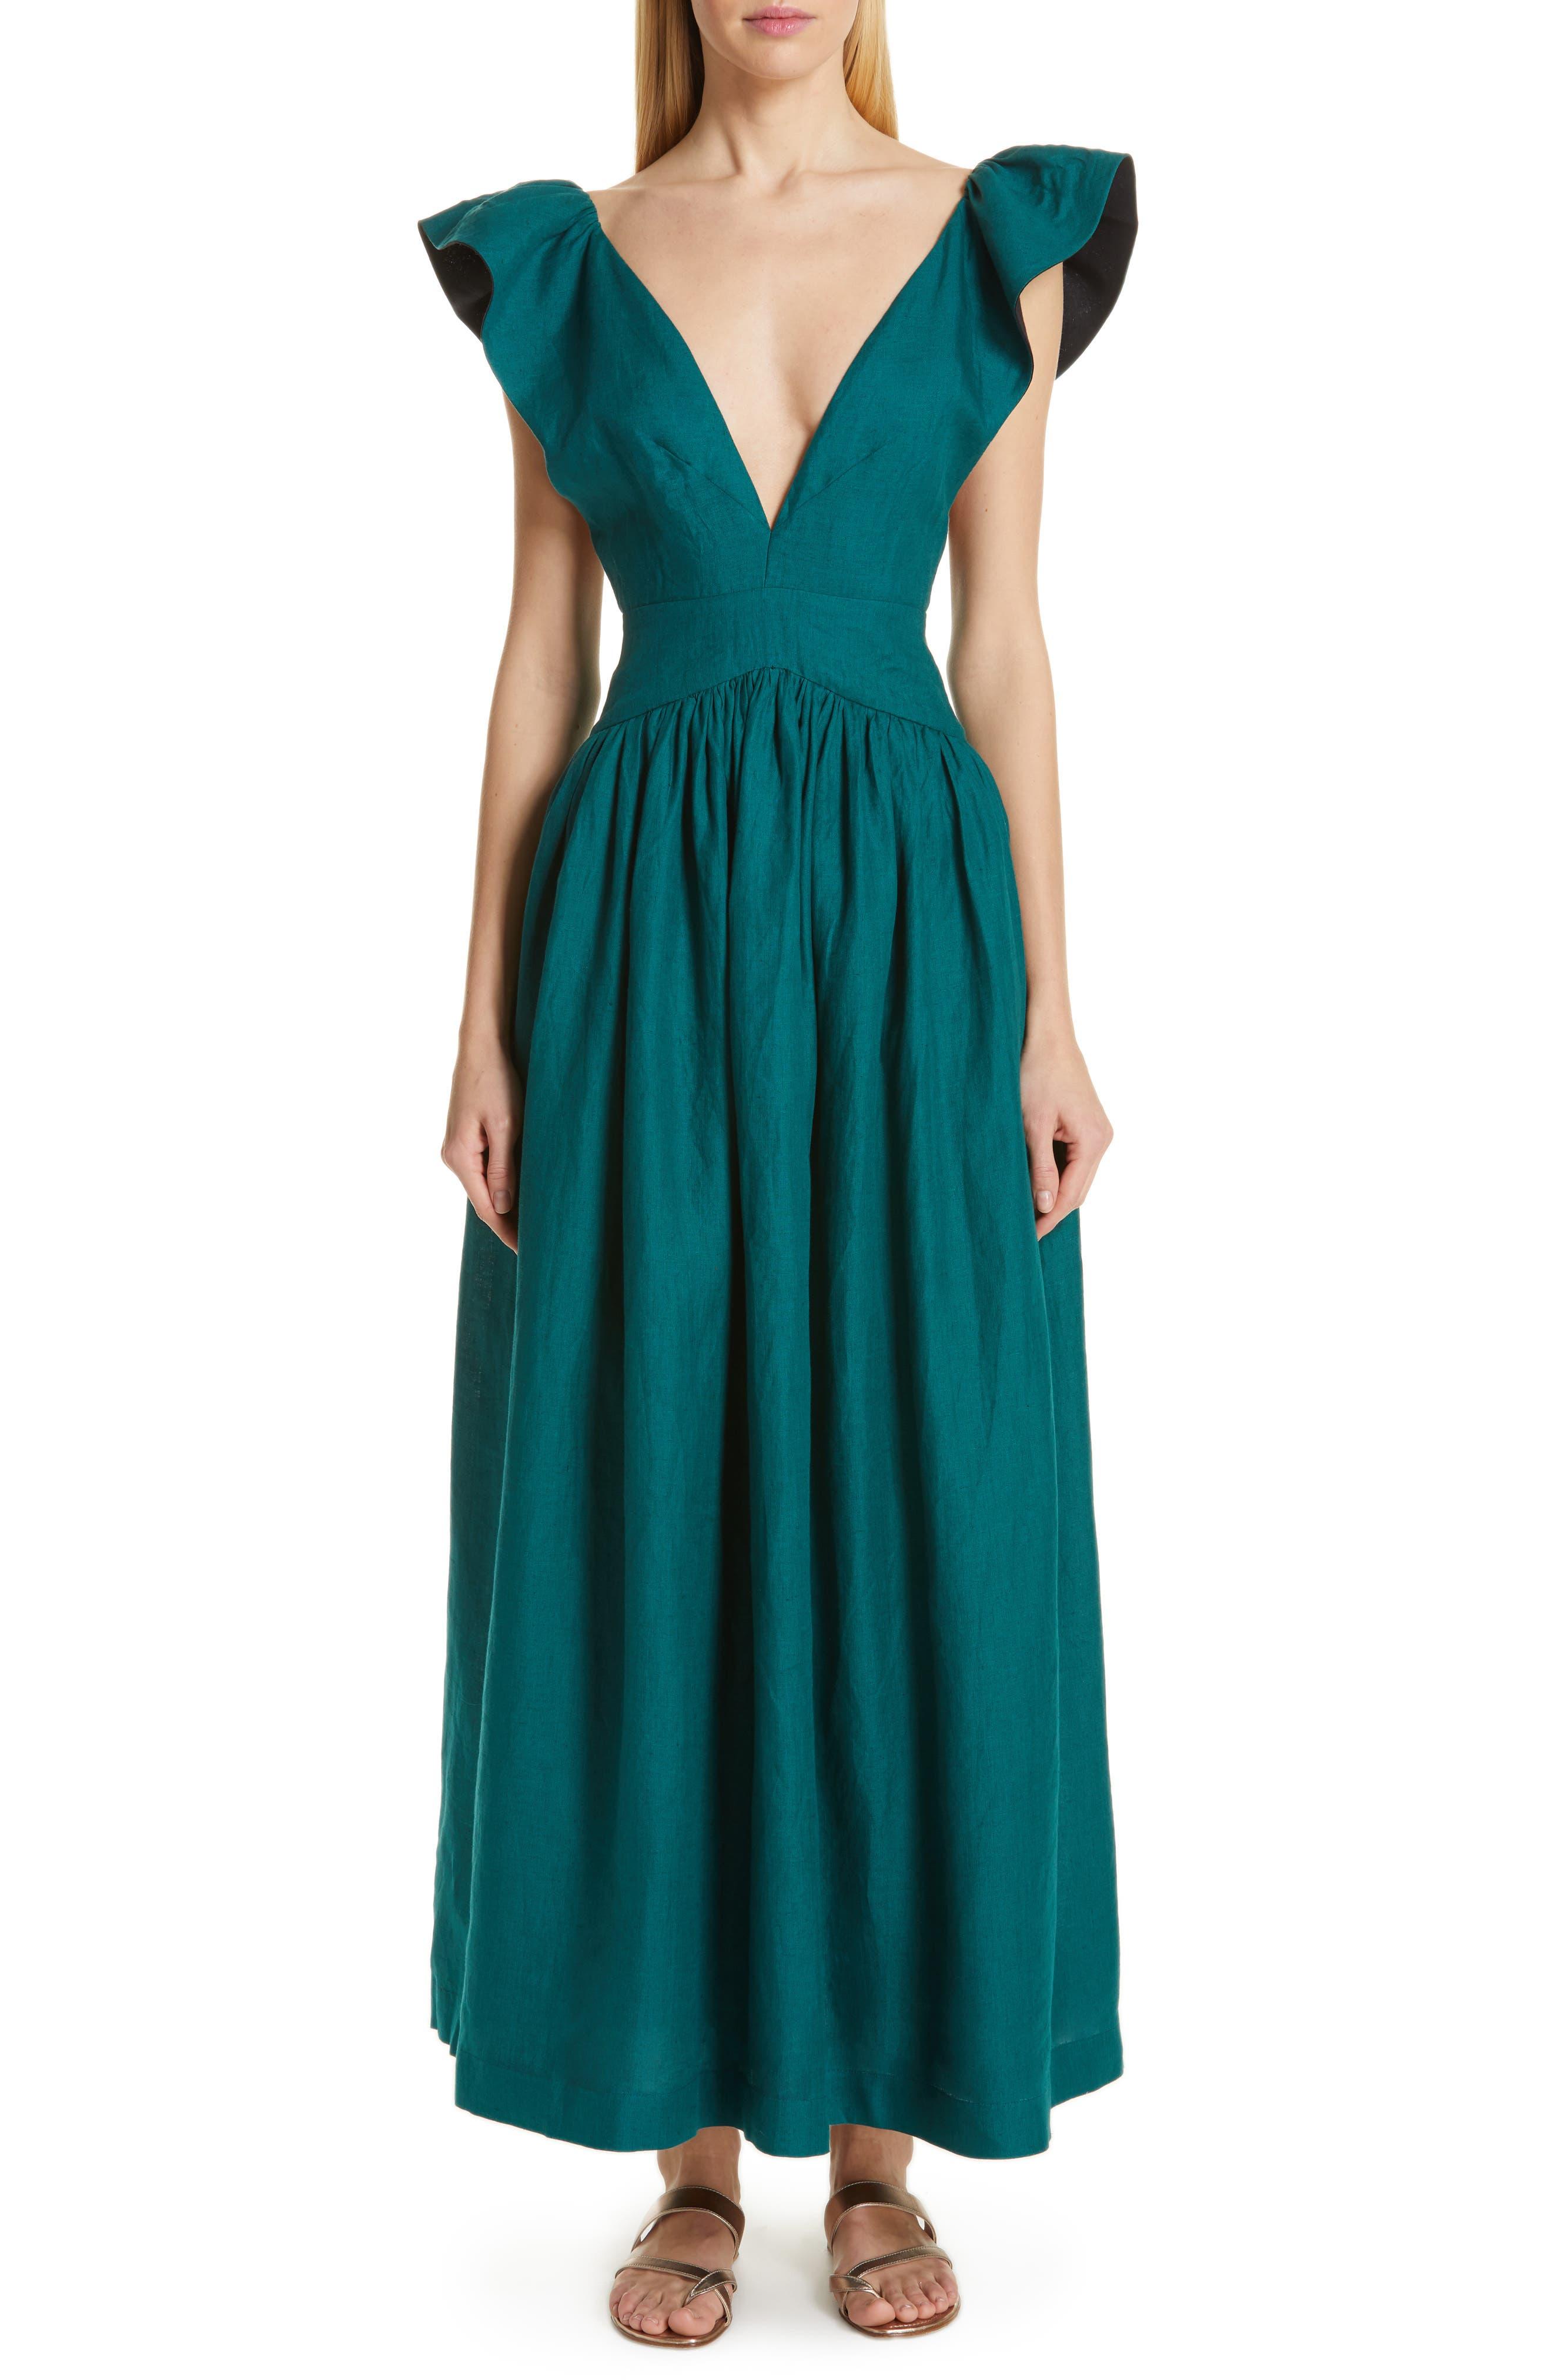 KALITA Persephone Linen Maxi Dress in Sea Nymph